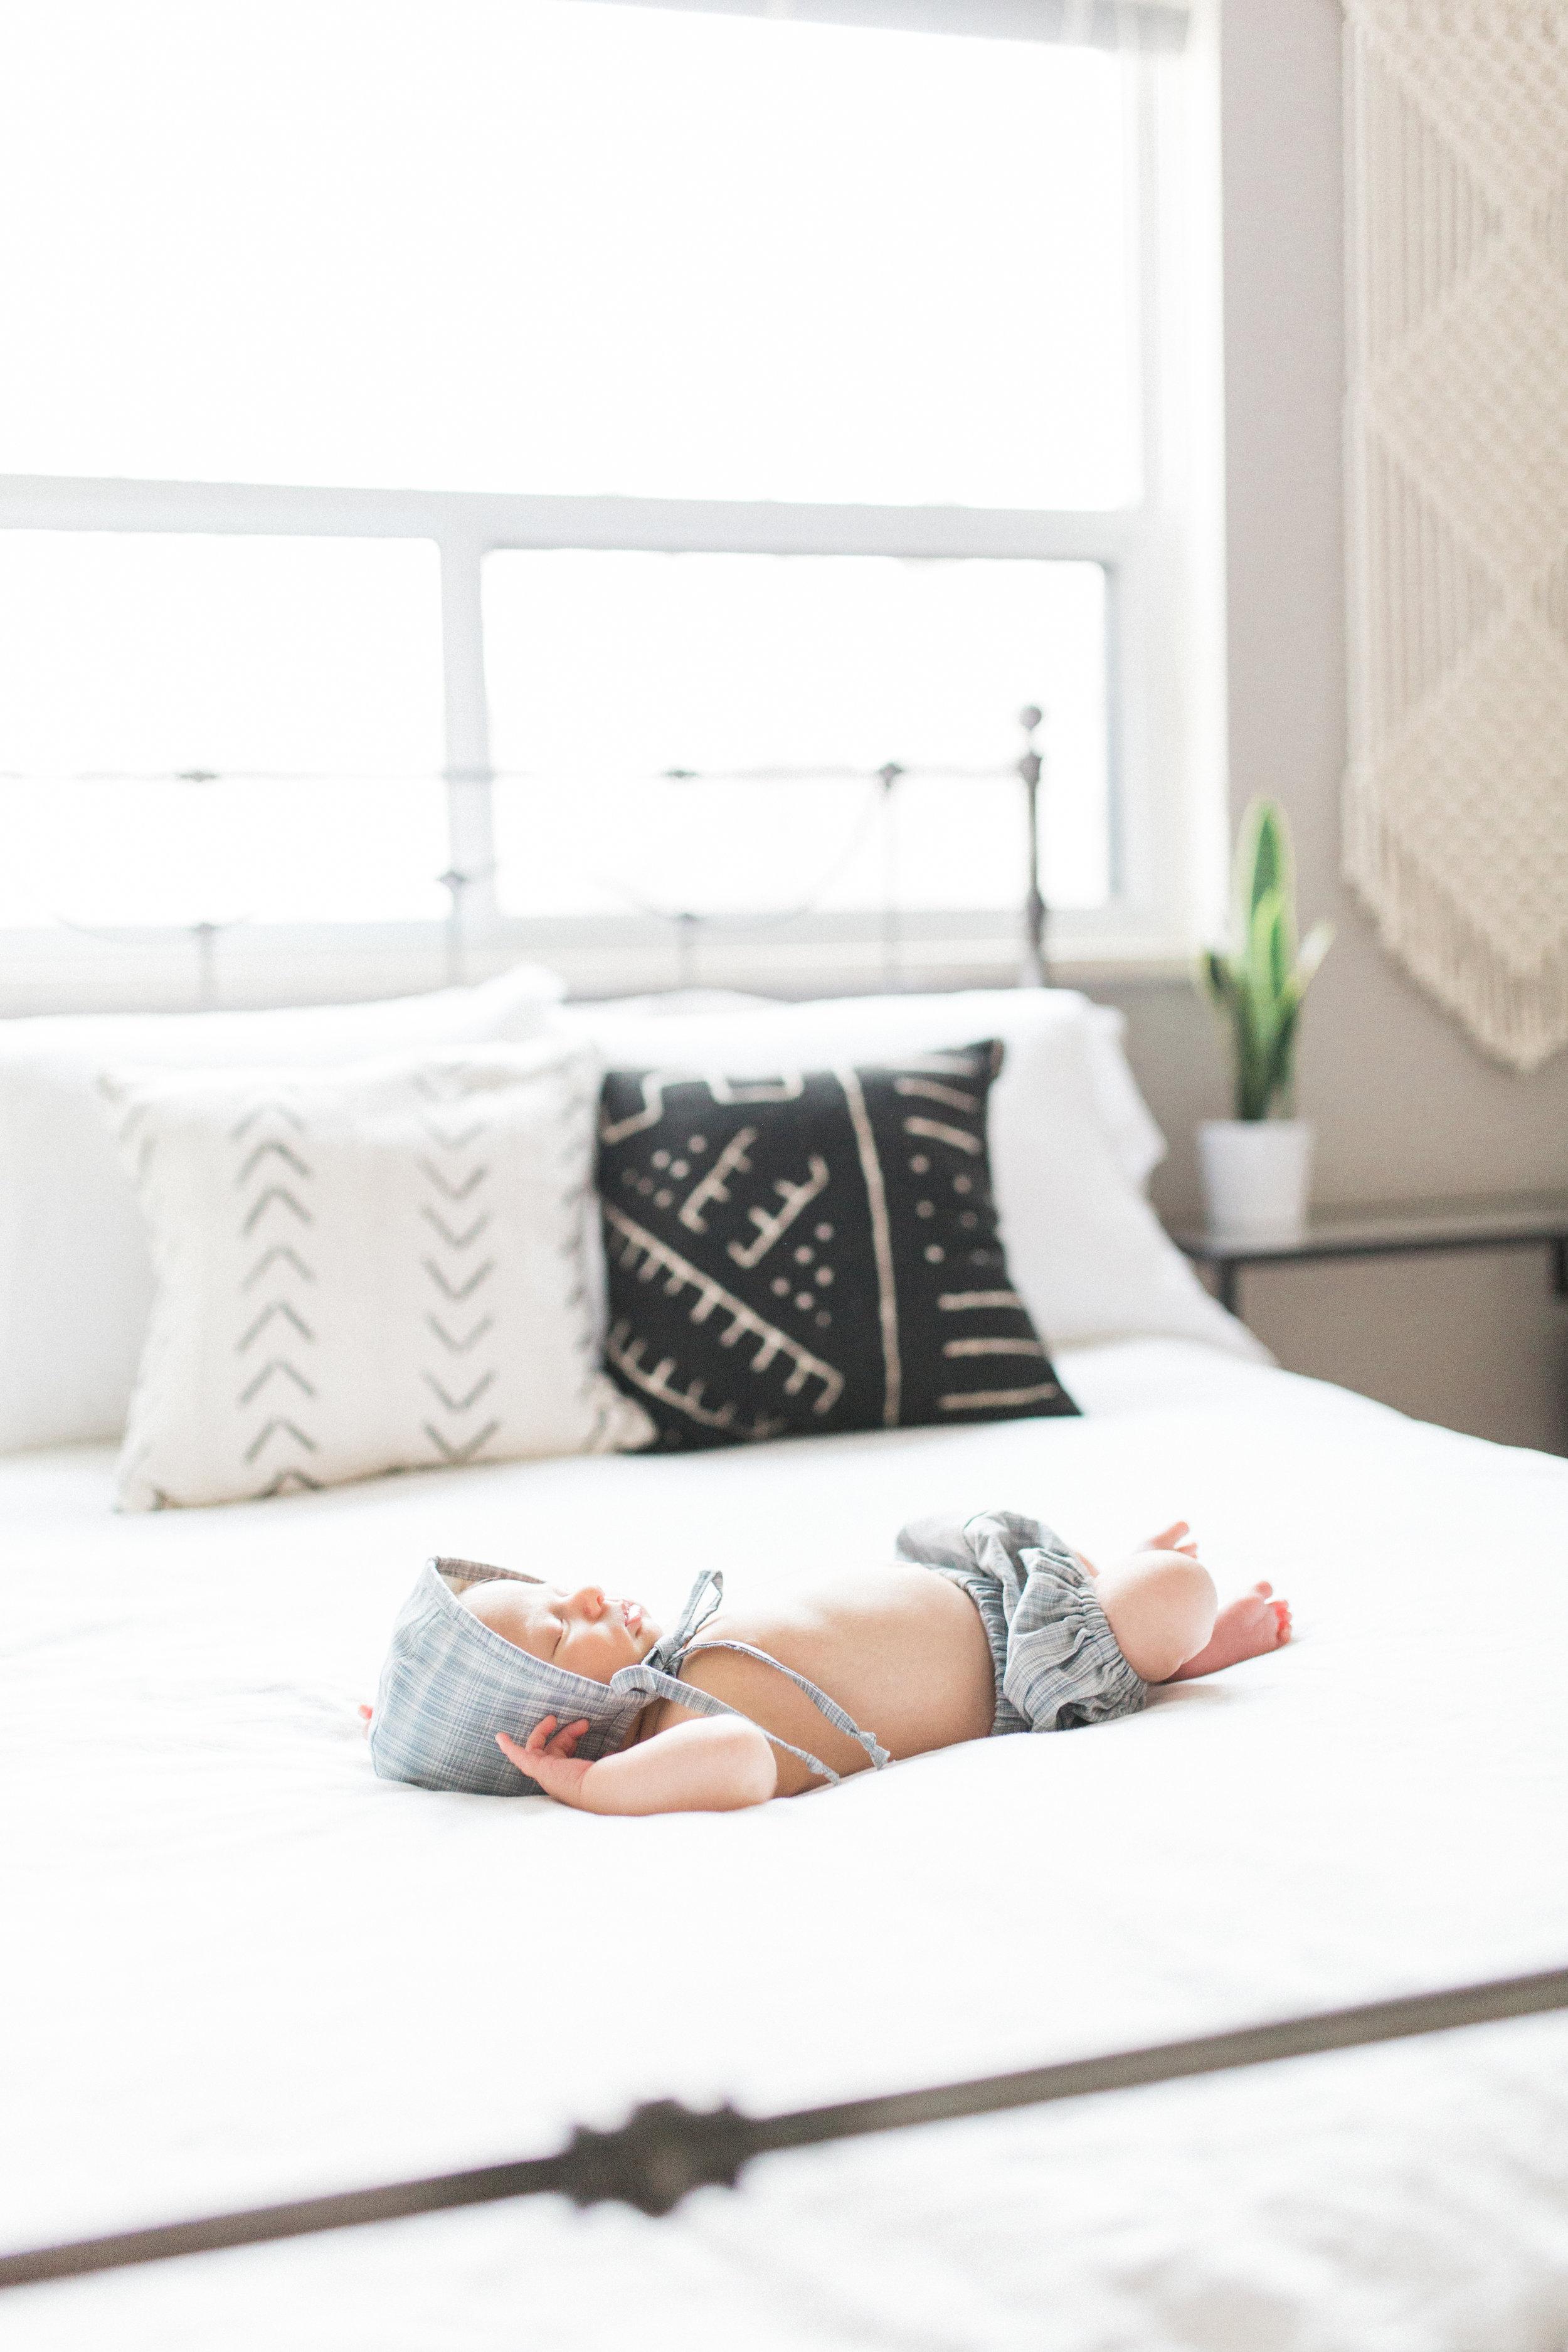 Elza Photographie - Toronto newborn photographer - Film and digital - Bright and airy - Mastin Labs - Motherhood